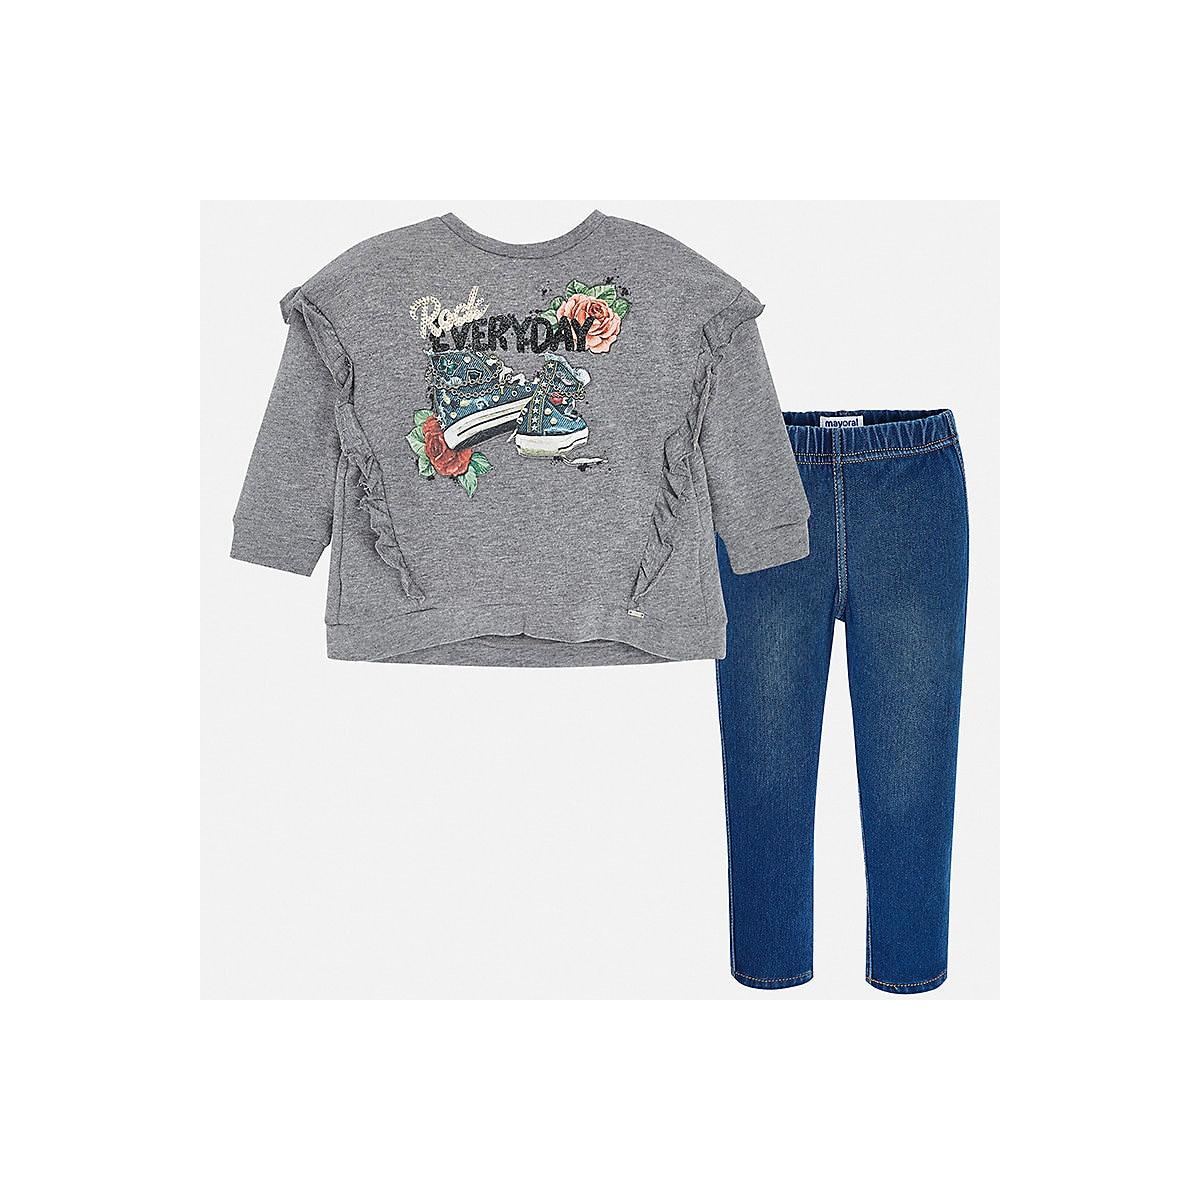 MAYORAL Children's Sets 8848793 Cotton Girls Fashion clothing costume for girl leggings T-shirt